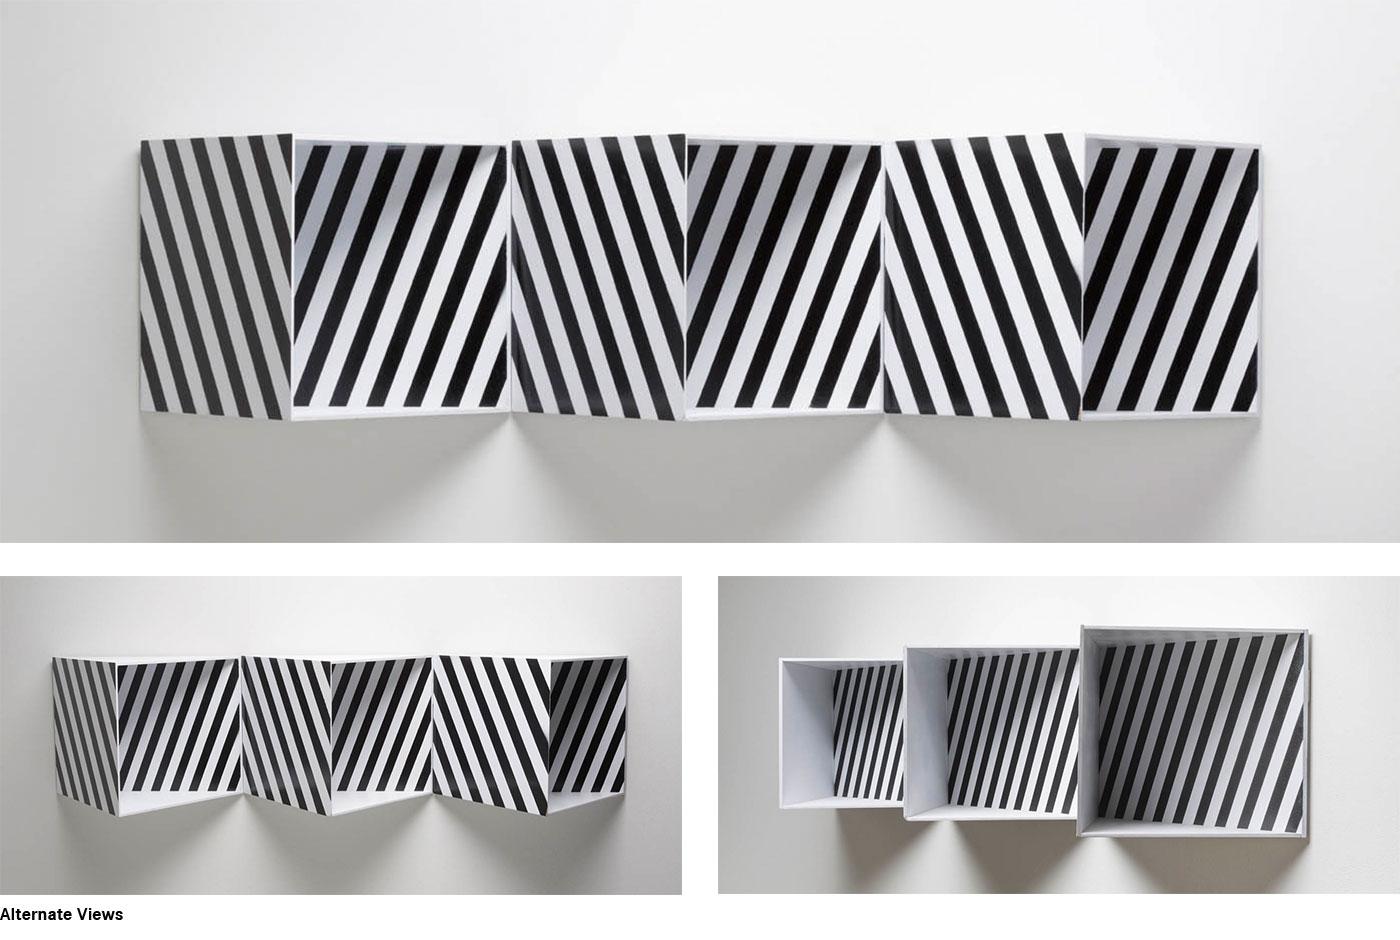 Vineta Chugh - Illusion Shelves